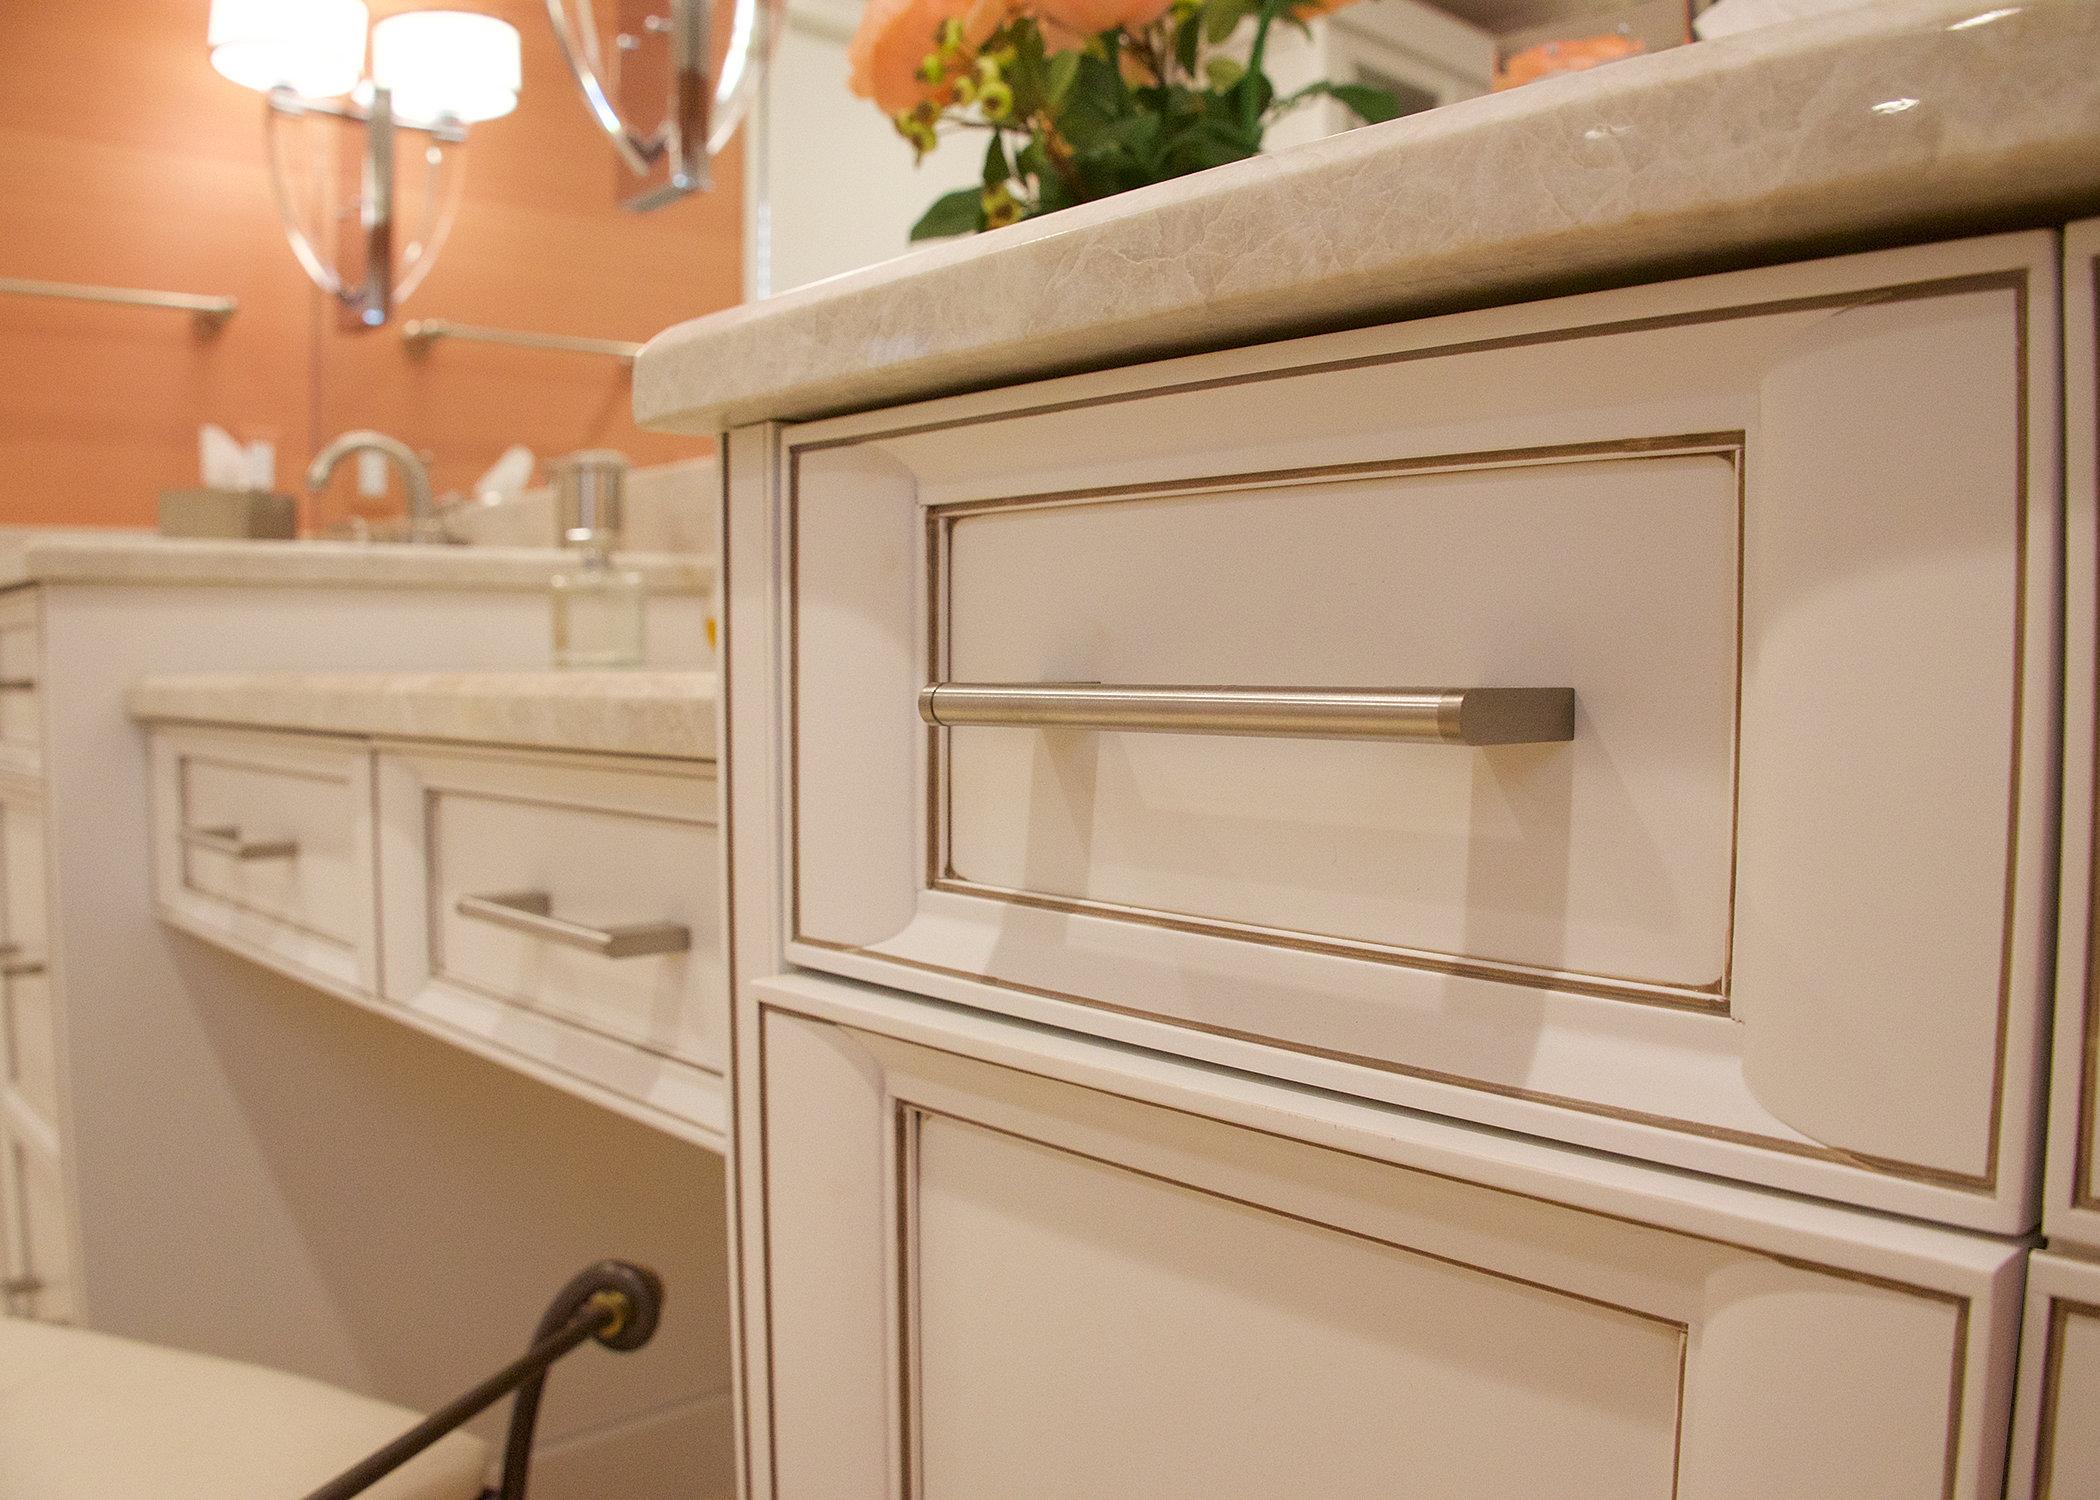 gardner builders, inc. custom kitchen and bath design | master